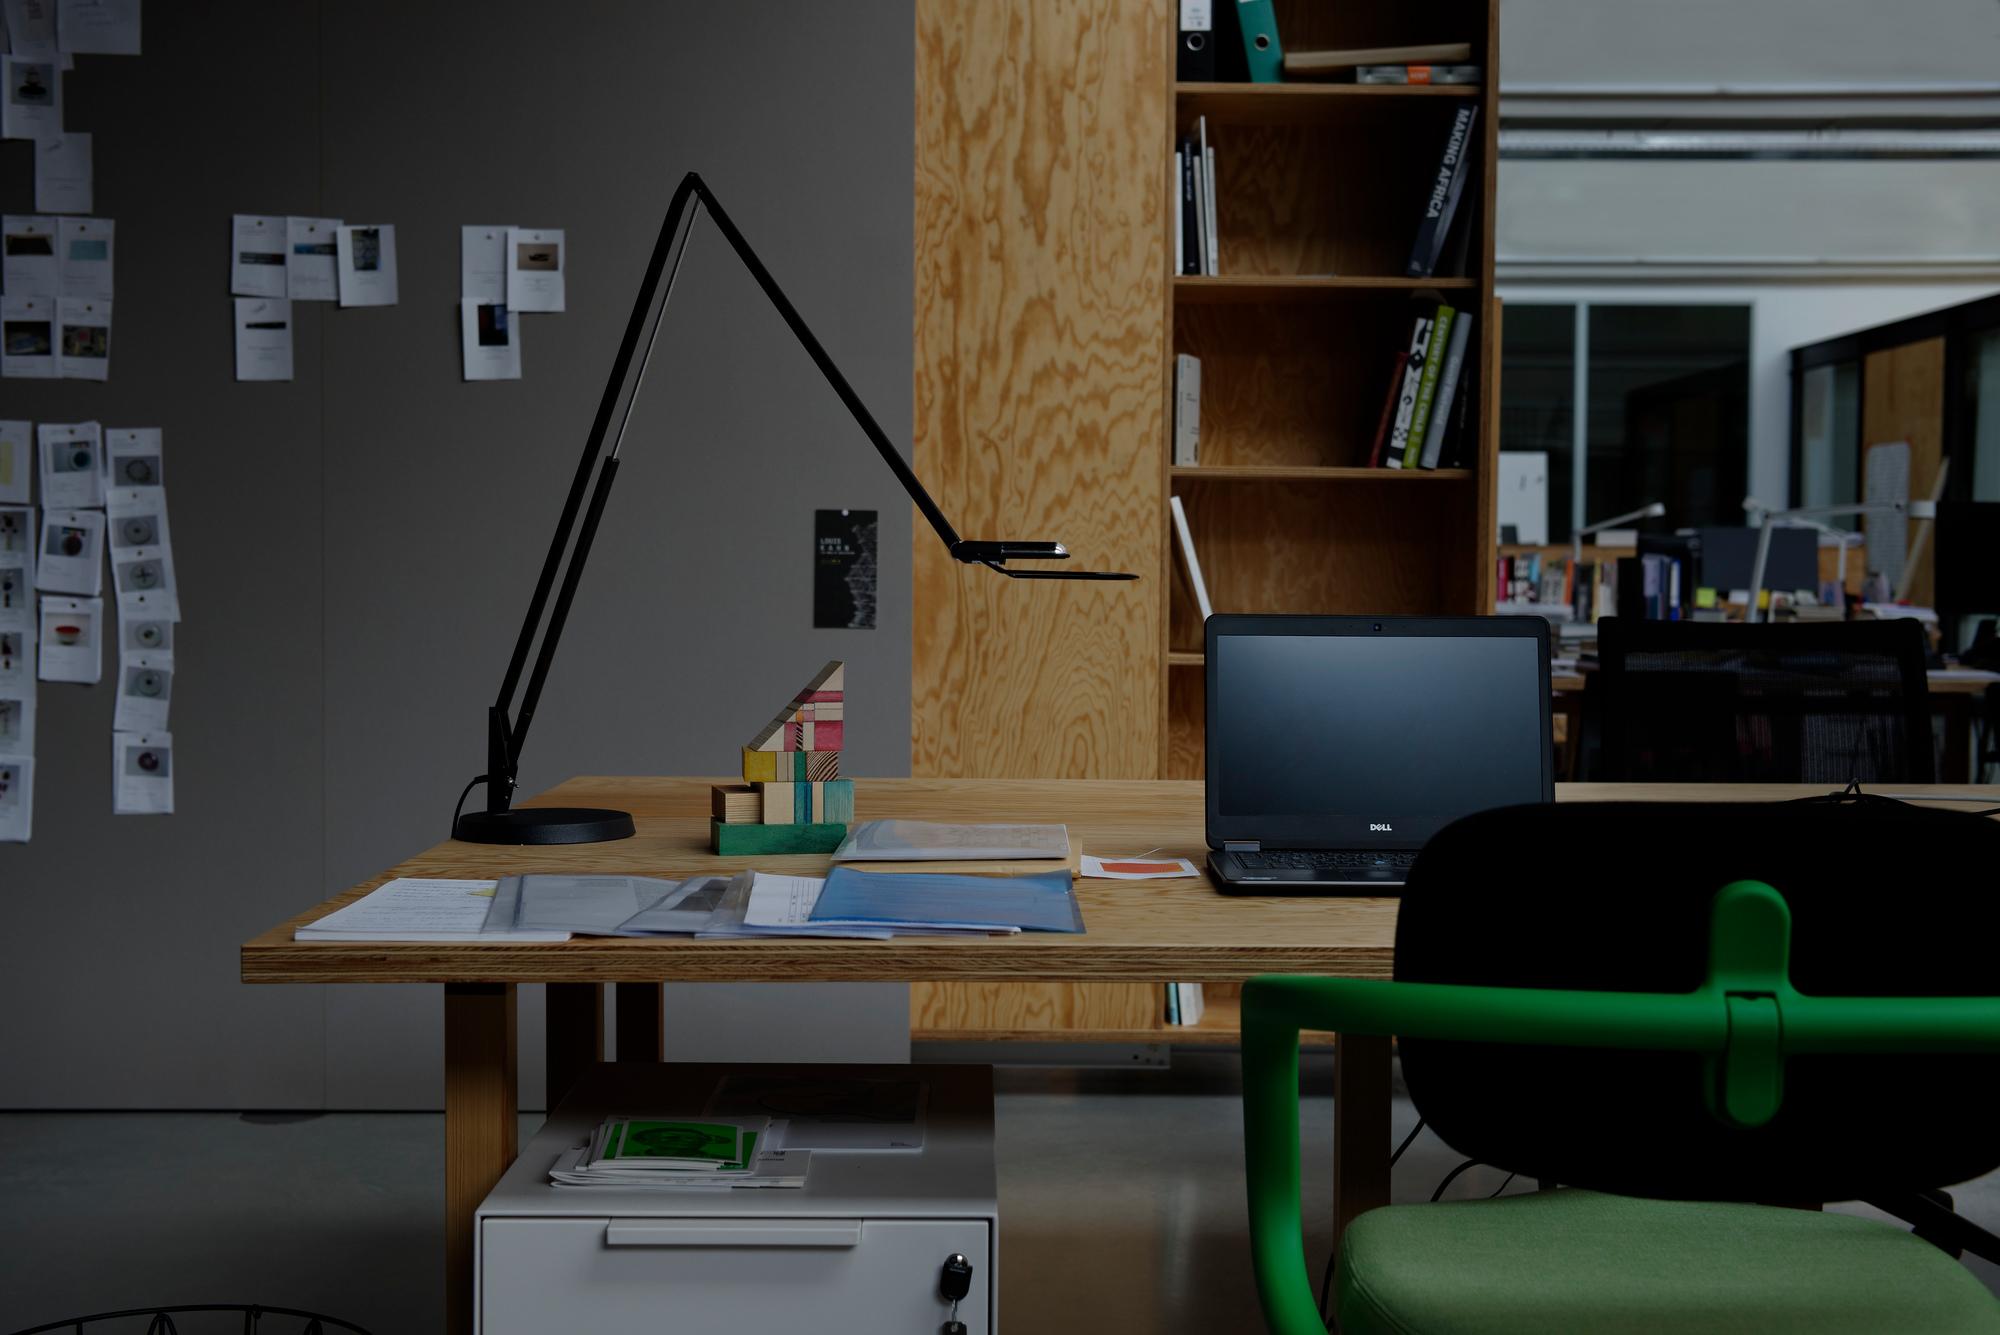 Accessoire Liftolino / Liftolino Table Lamp Thread Adapter Belux